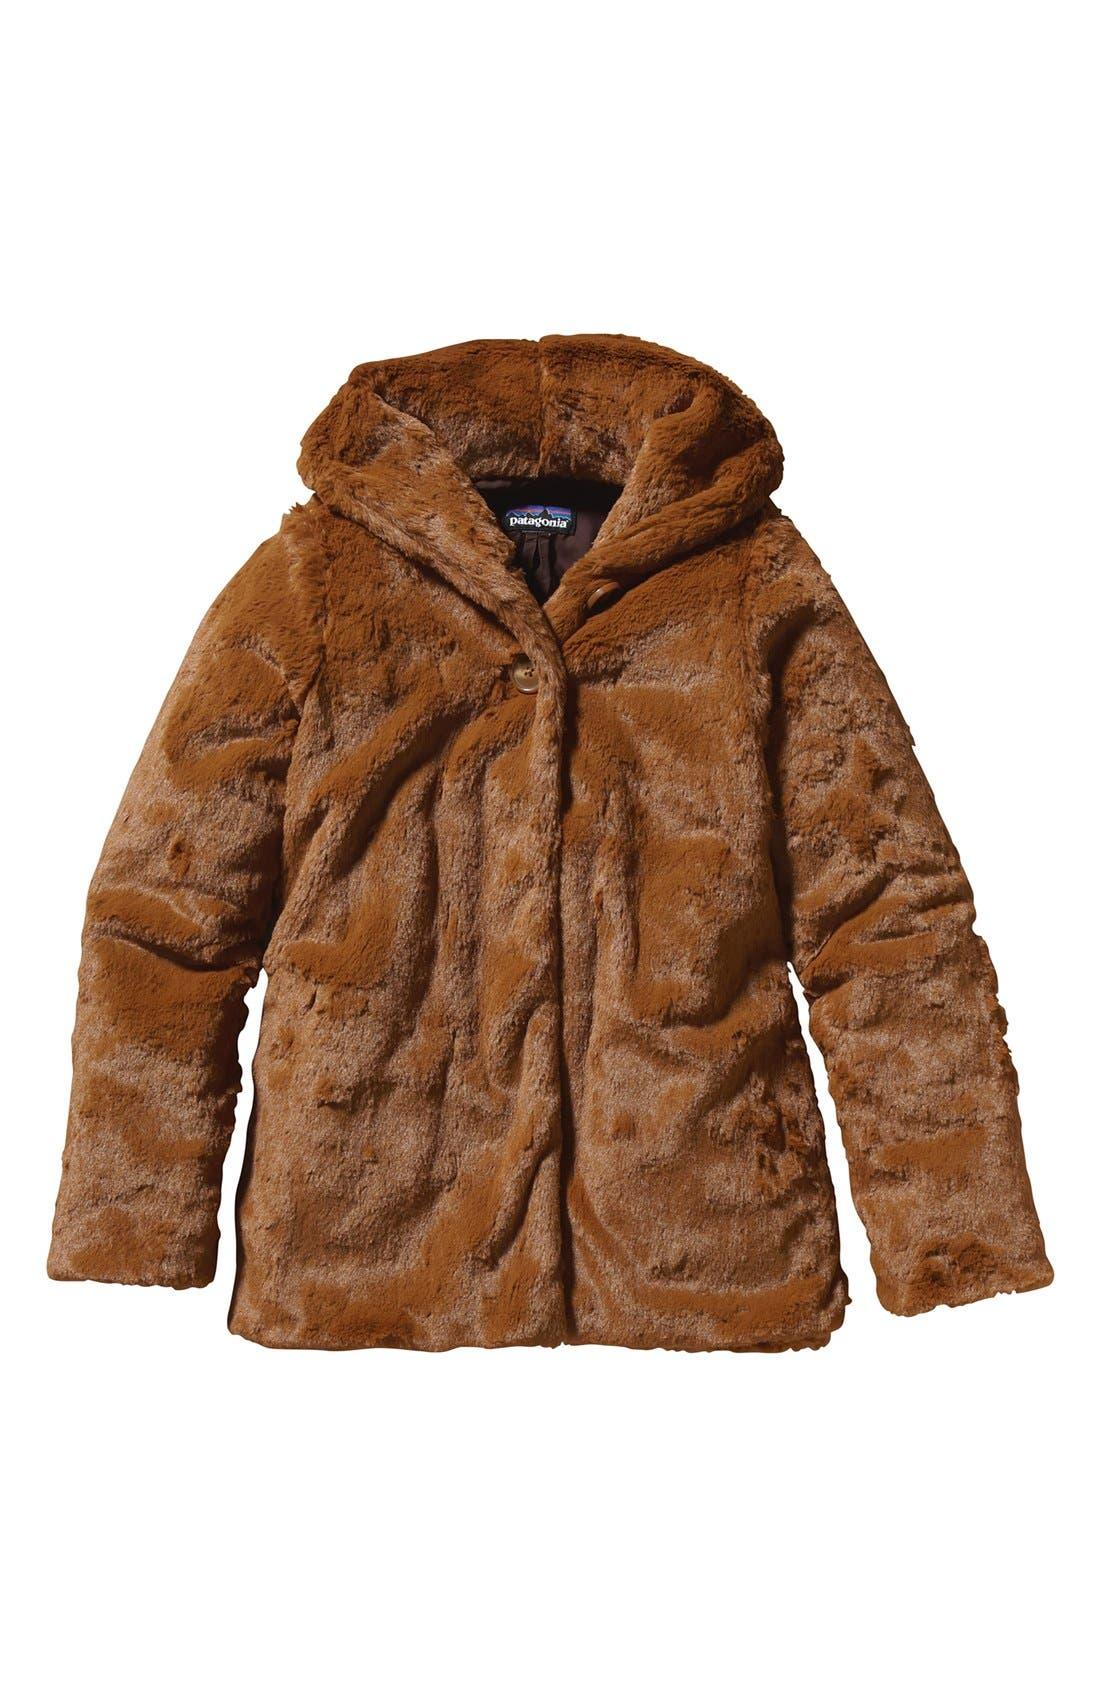 Alternate Image 1 Selected - Patagonia 'Pelage' Jacket (Little Girls & Big Girls)